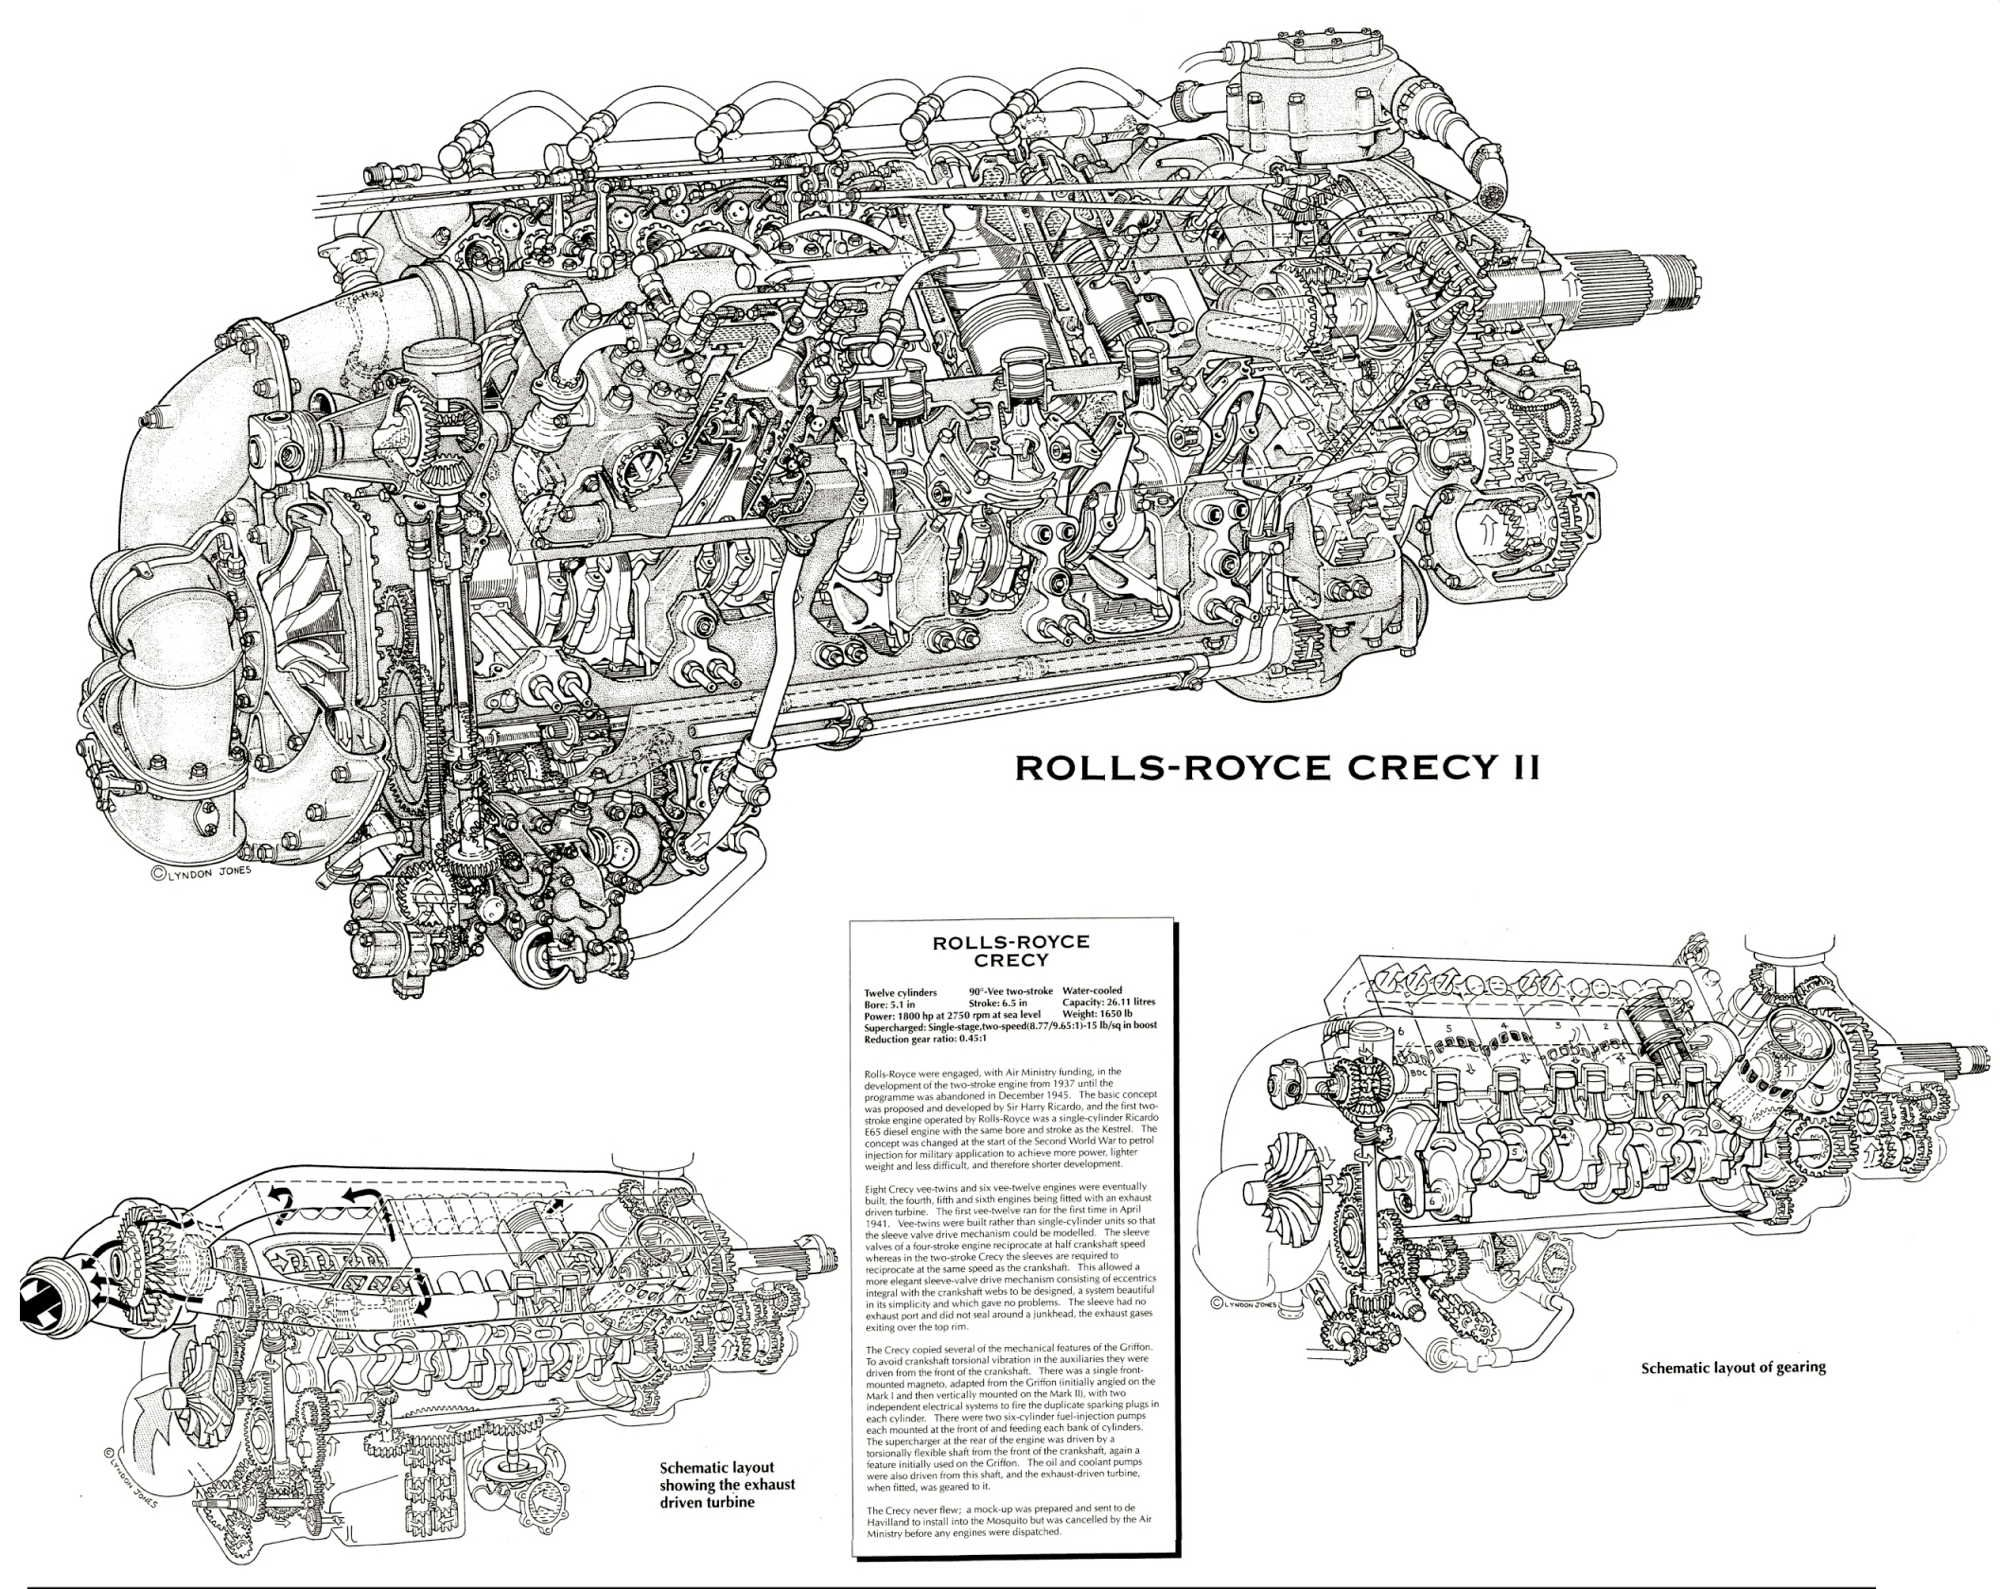 hight resolution of rolls royce crecy ii engine cutaway